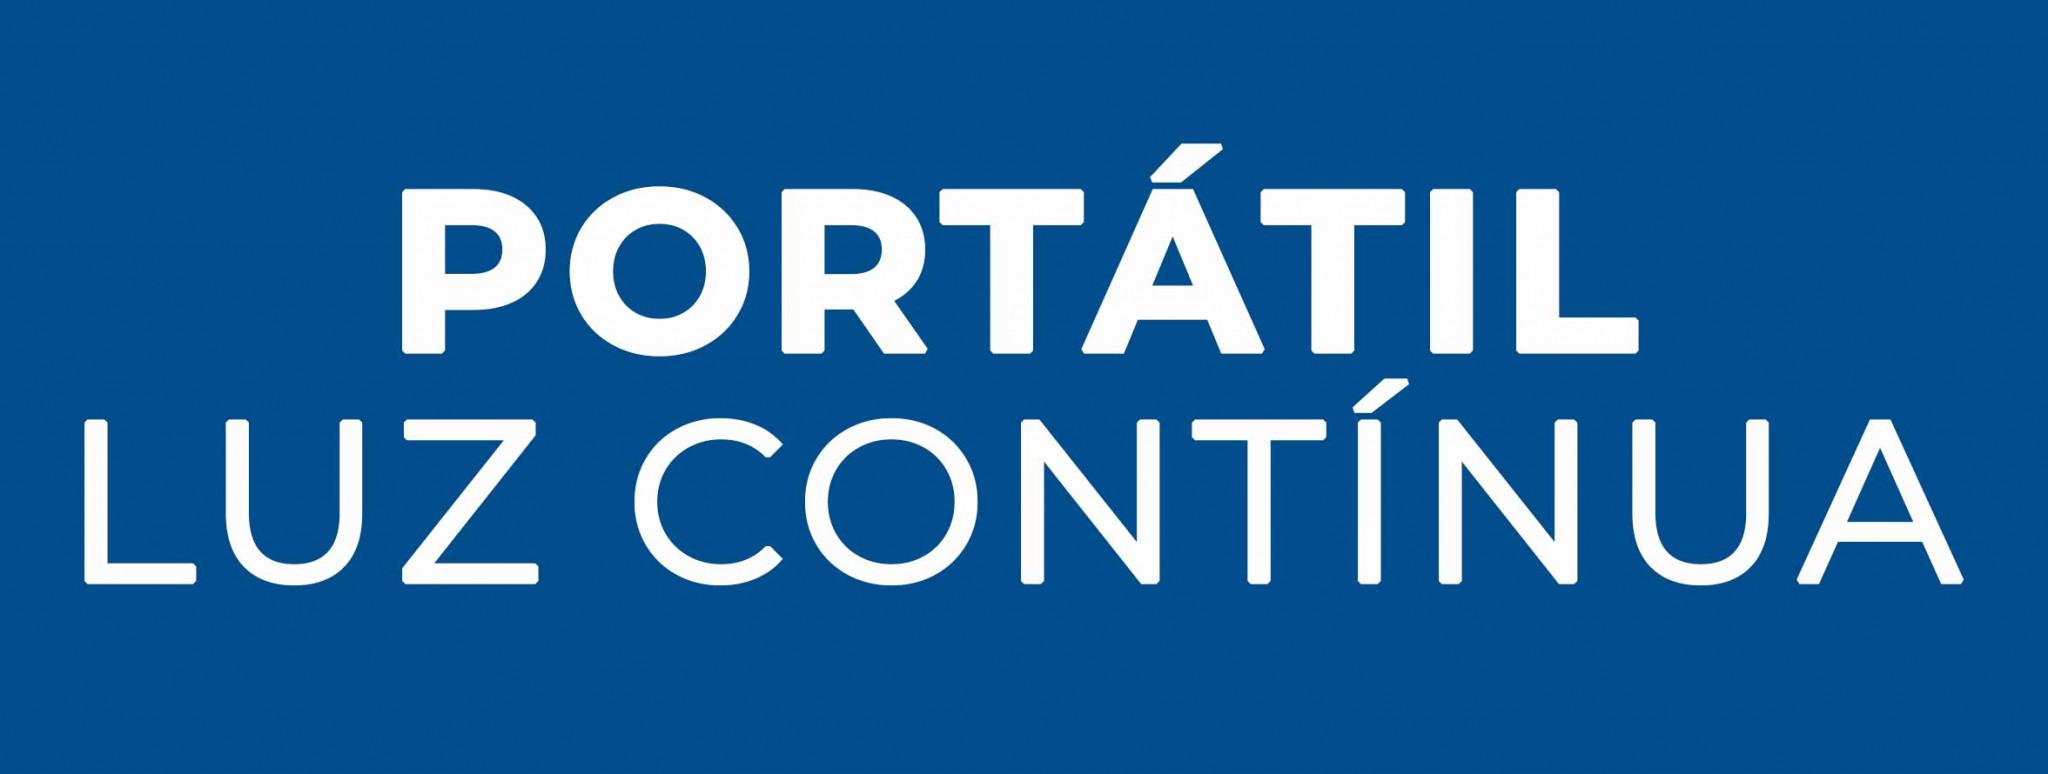 Portátil Luz Contínua